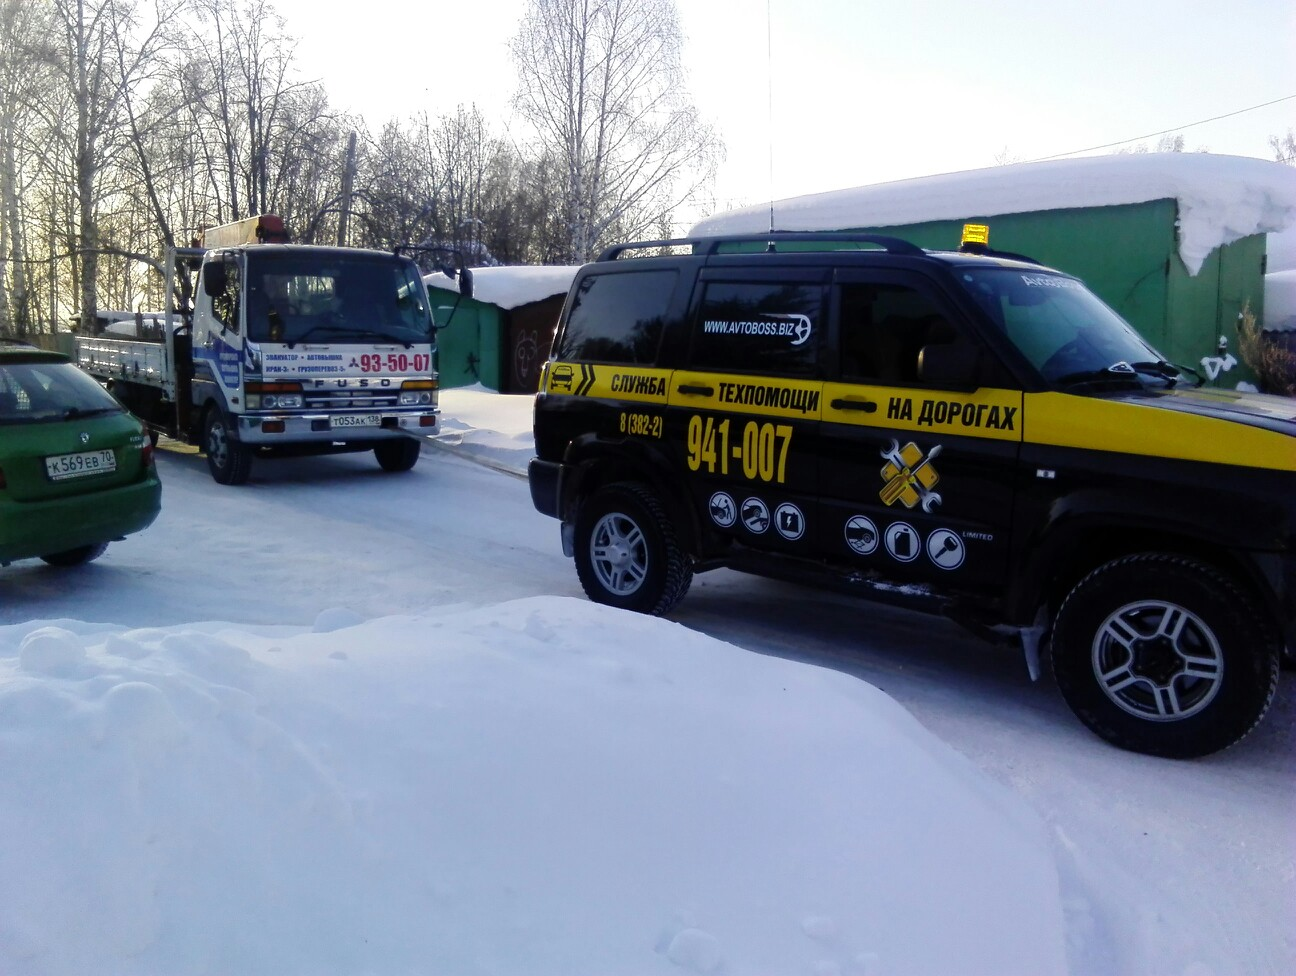 Служба ТехПомощь на дорогах 941-007 в г.Томске AvtoBoss